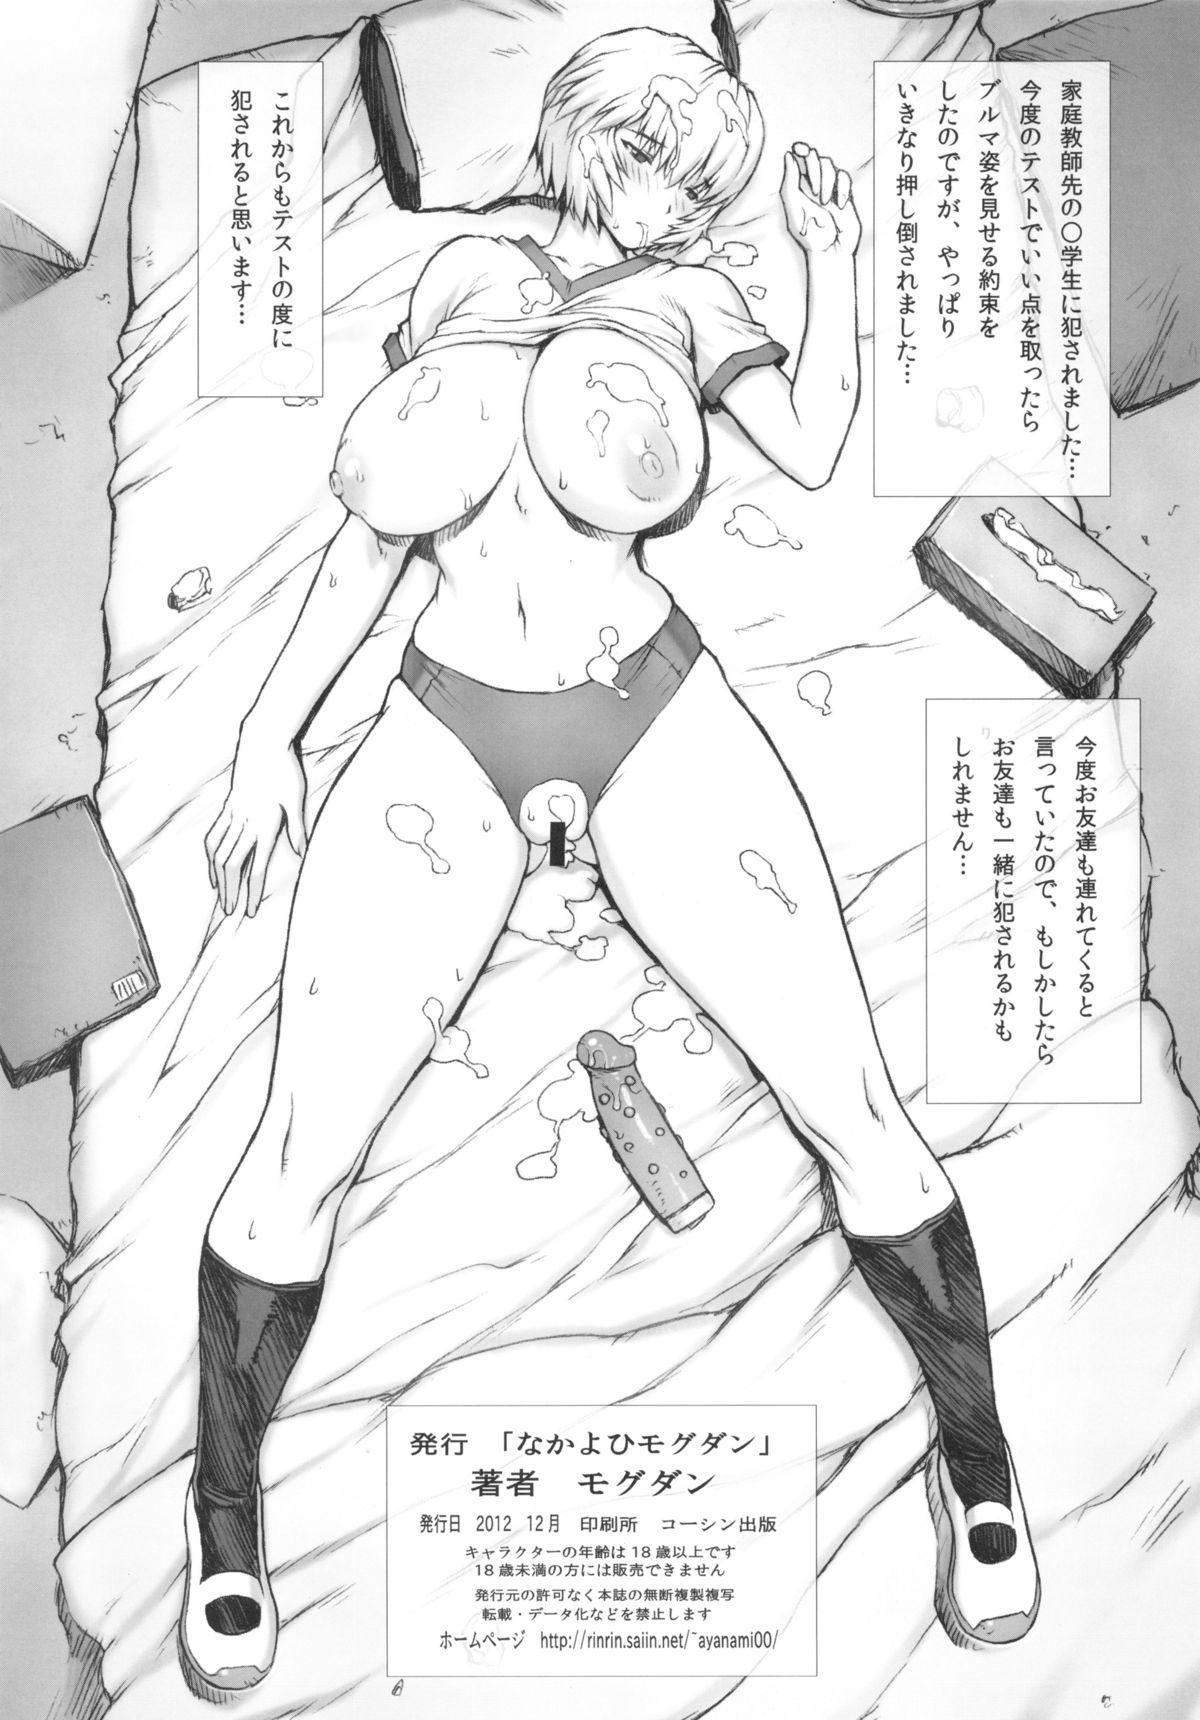 Ayanami Dai 4 Kai + Omake Bon + Postcard 47